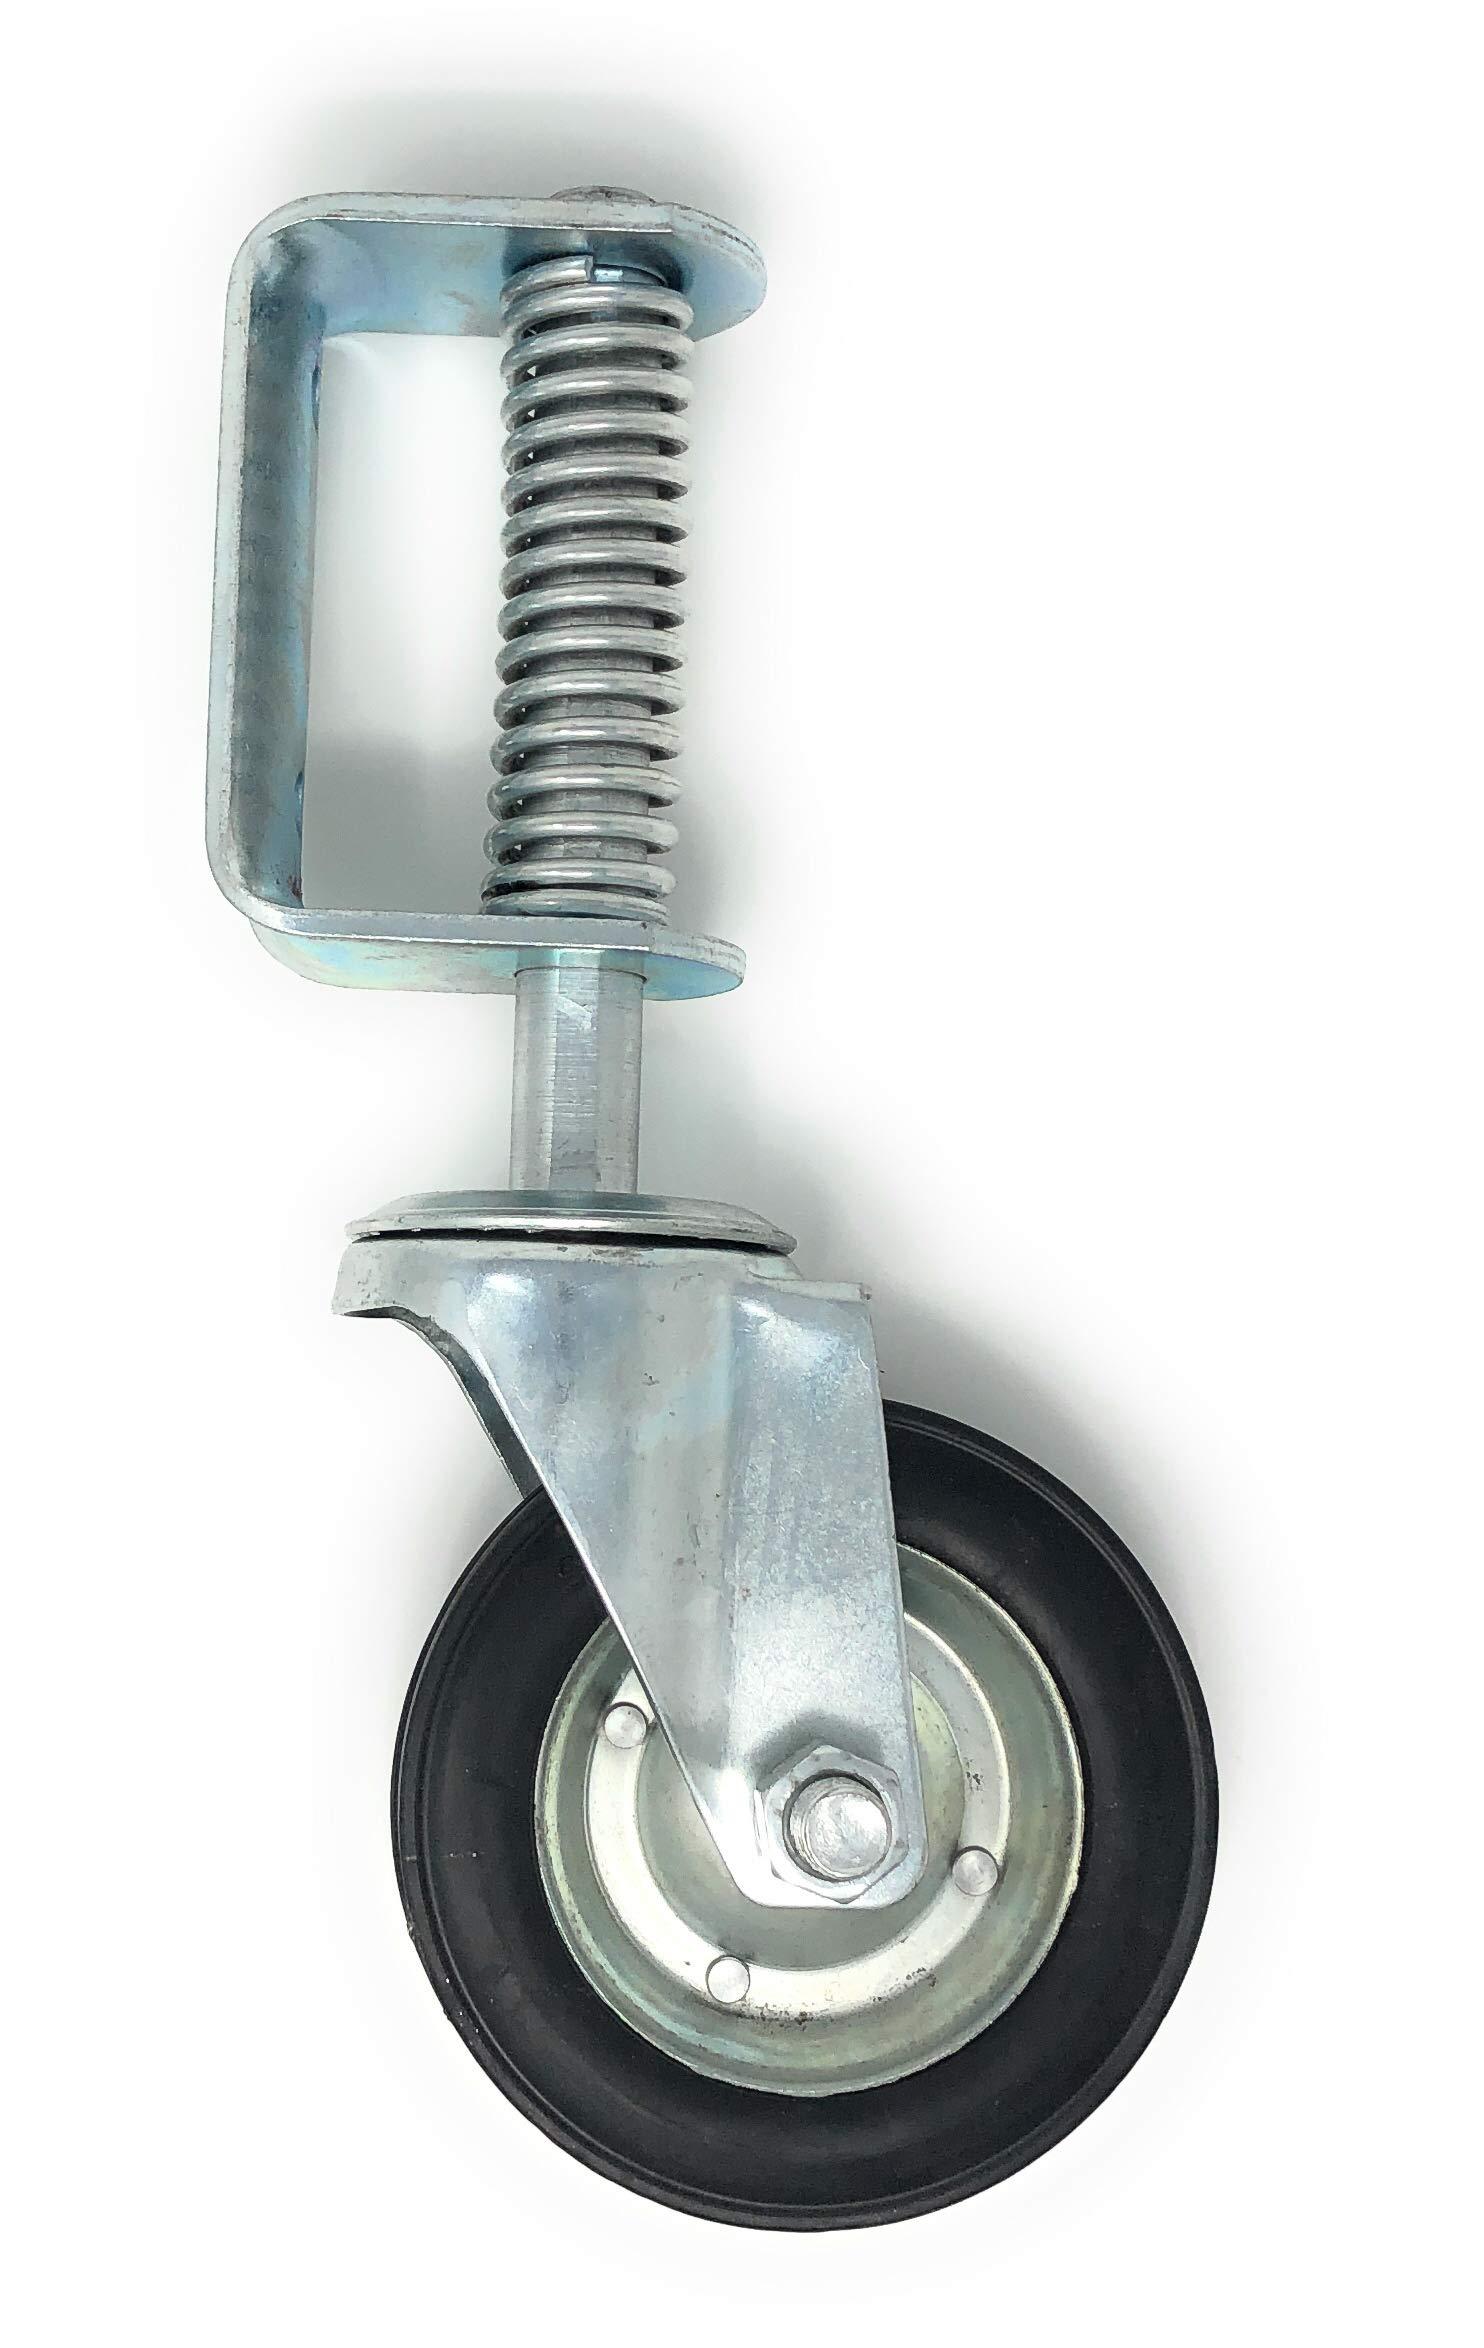 New 6 Inch Spring Loaded Swivel Wheel Heavy Duty 14'' Overall Height by FenceSmart4U